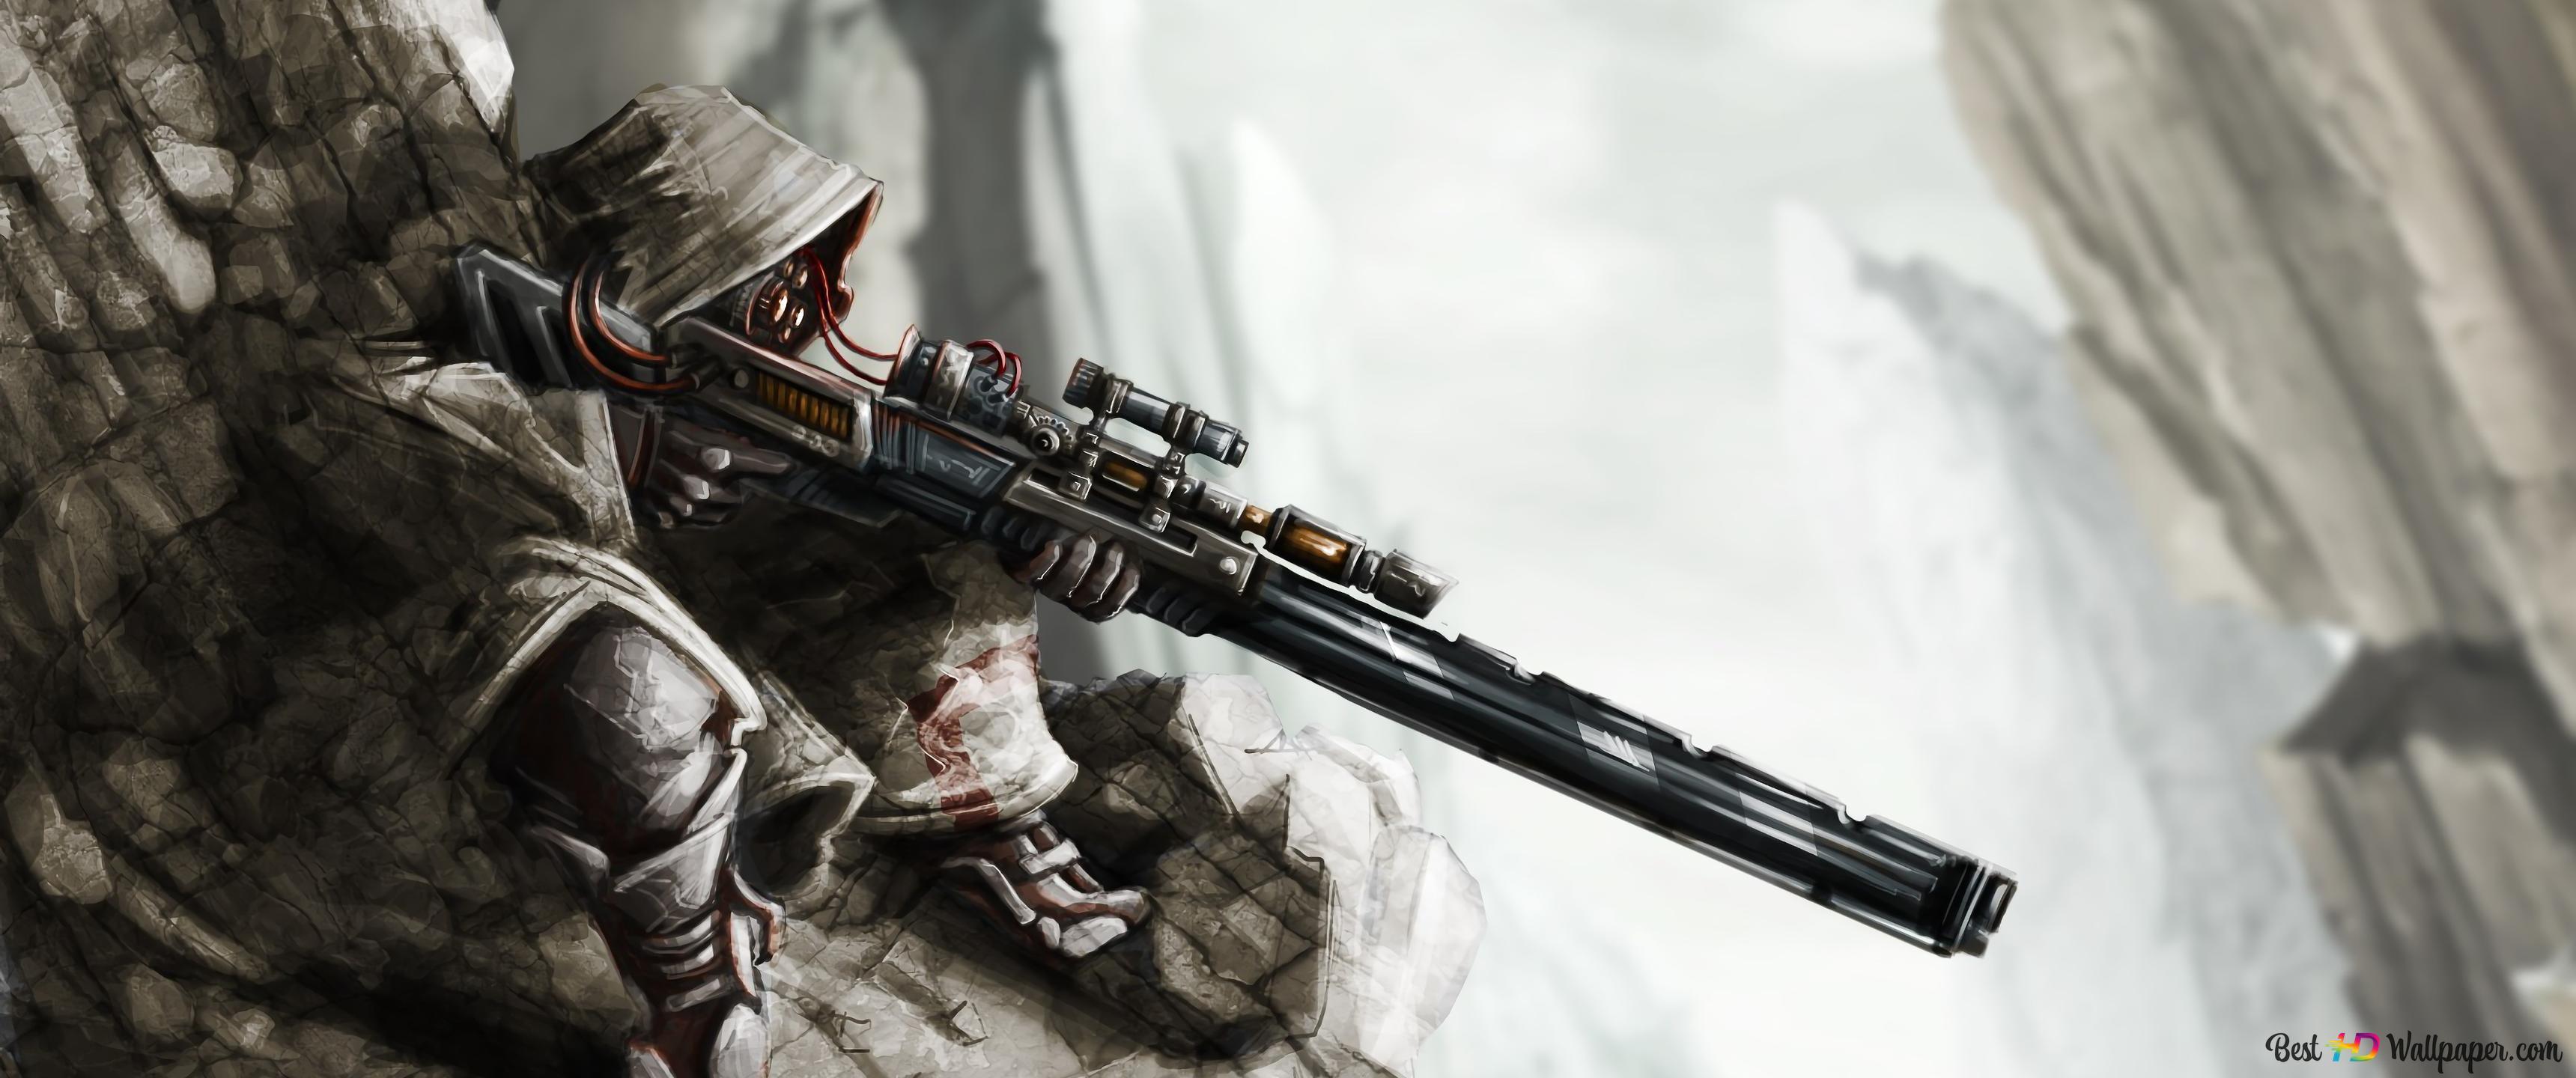 Soldier Sniper Rifle HD wallpaper download